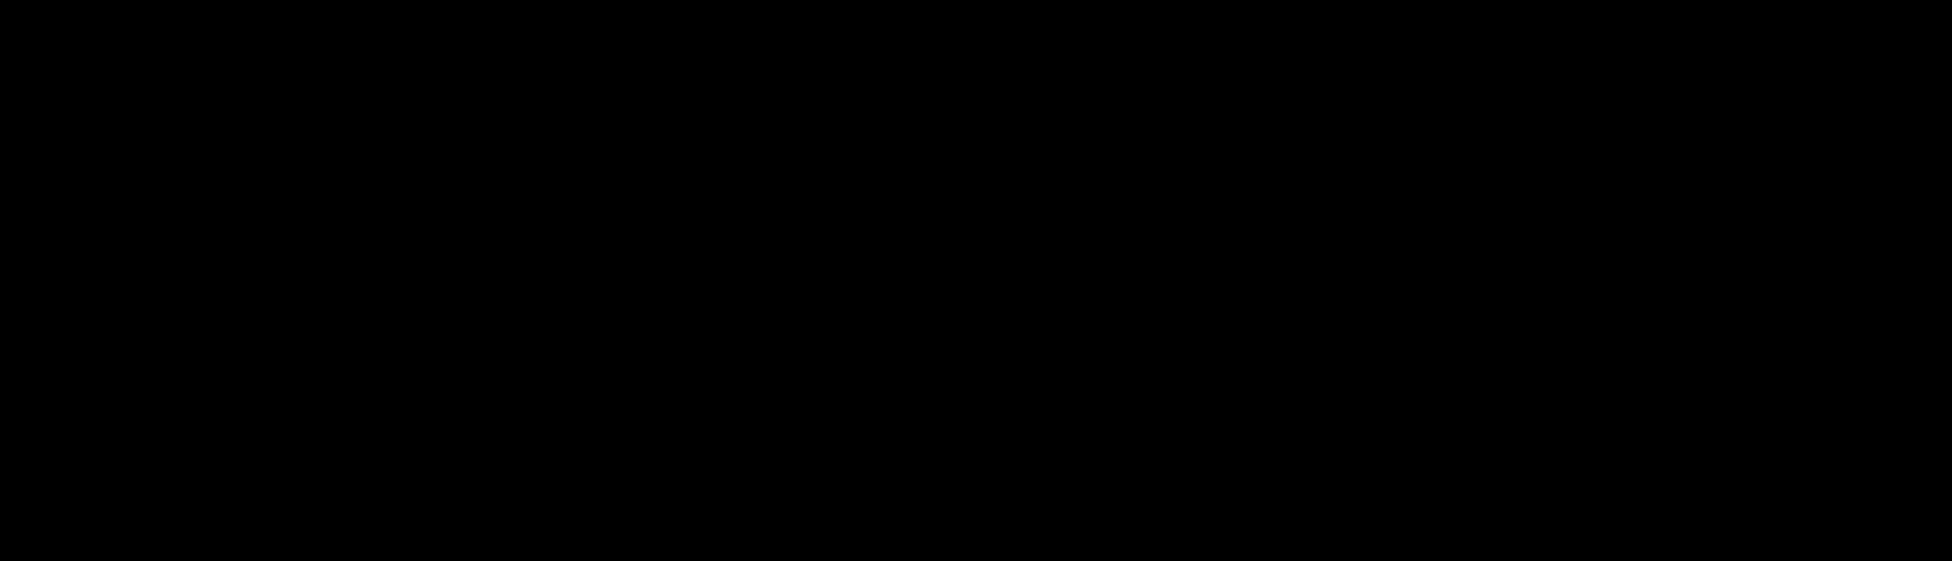 band banner krita png